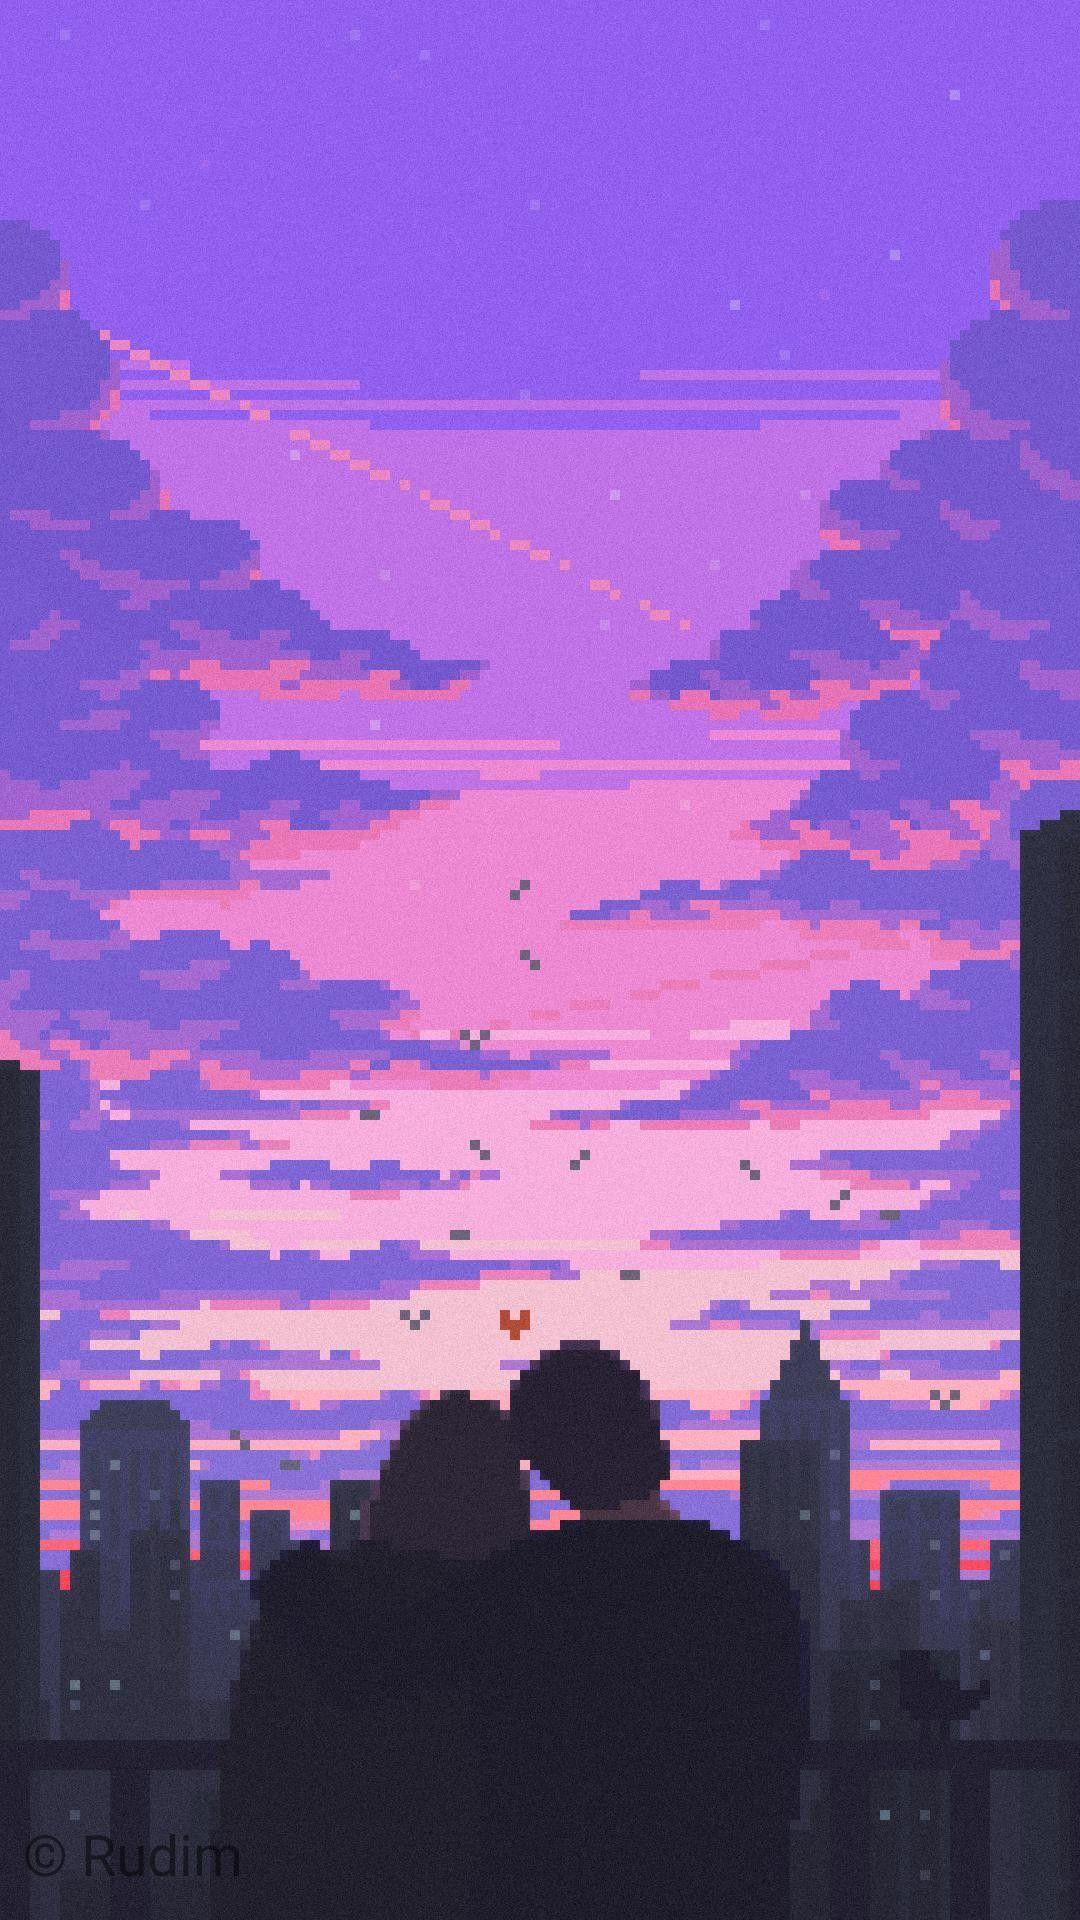 Pin by 김원준 on Пиксель-Арт   Anime pixel art, Pixel art, Pixel art background